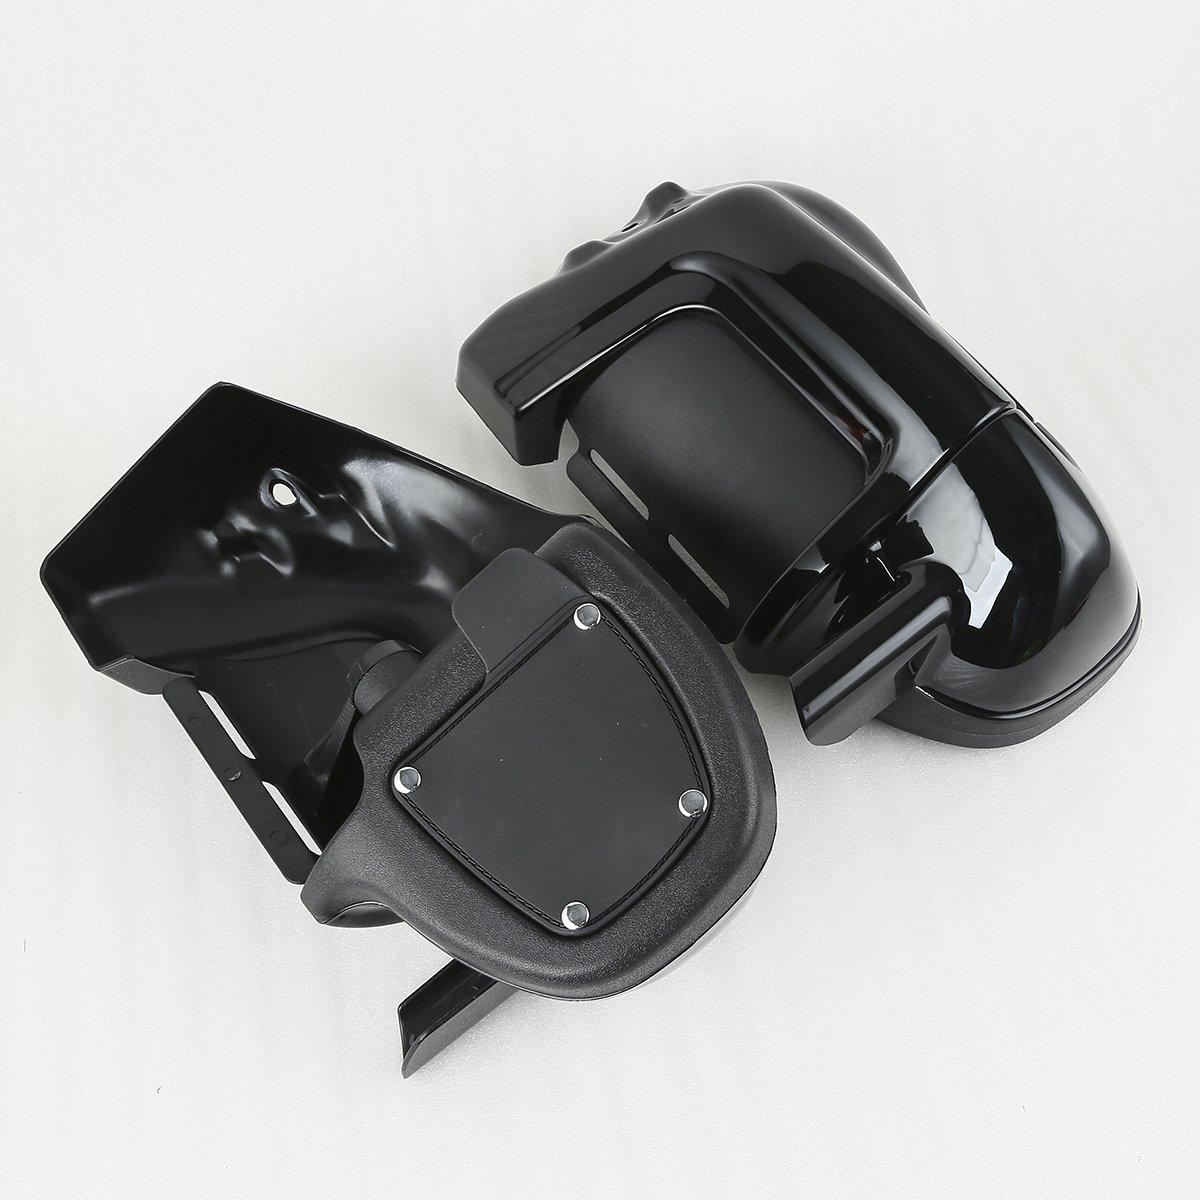 XMT-MOTO Black Lower Vented Leg Fairings Cap Glove Box For Harley-Davidson Touring Models 1983-2013 by XMT-MOTO (Image #4)